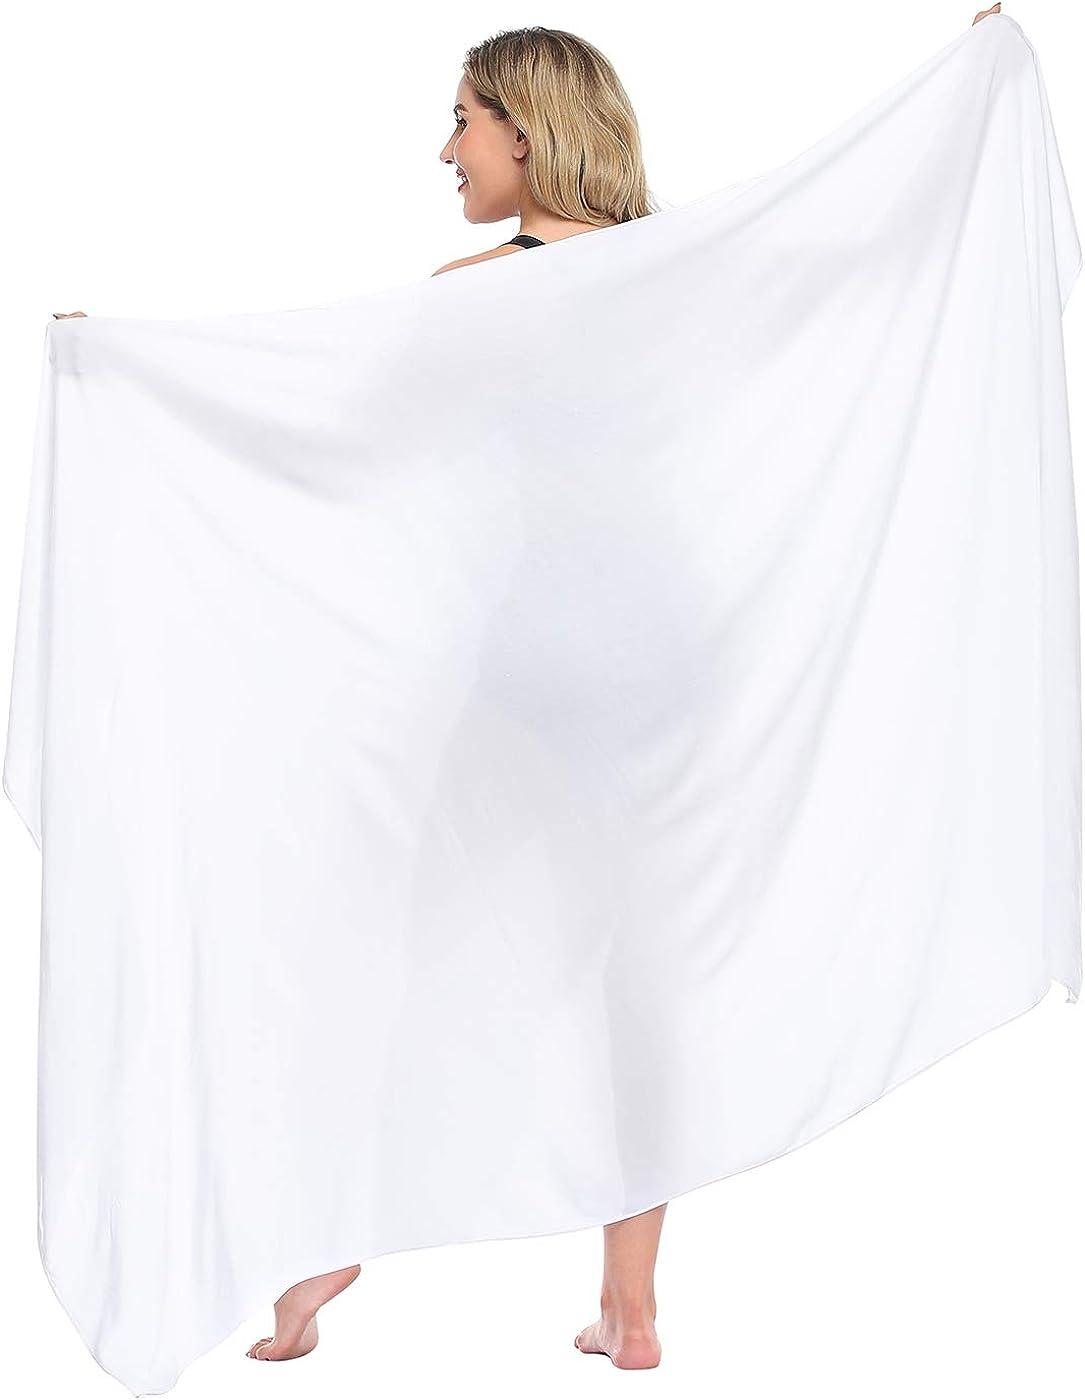 HDE Plus Size UPF 30+ Pareo Swimsuit Cover Up Fringeless Sarong Sun Shawl Wrap